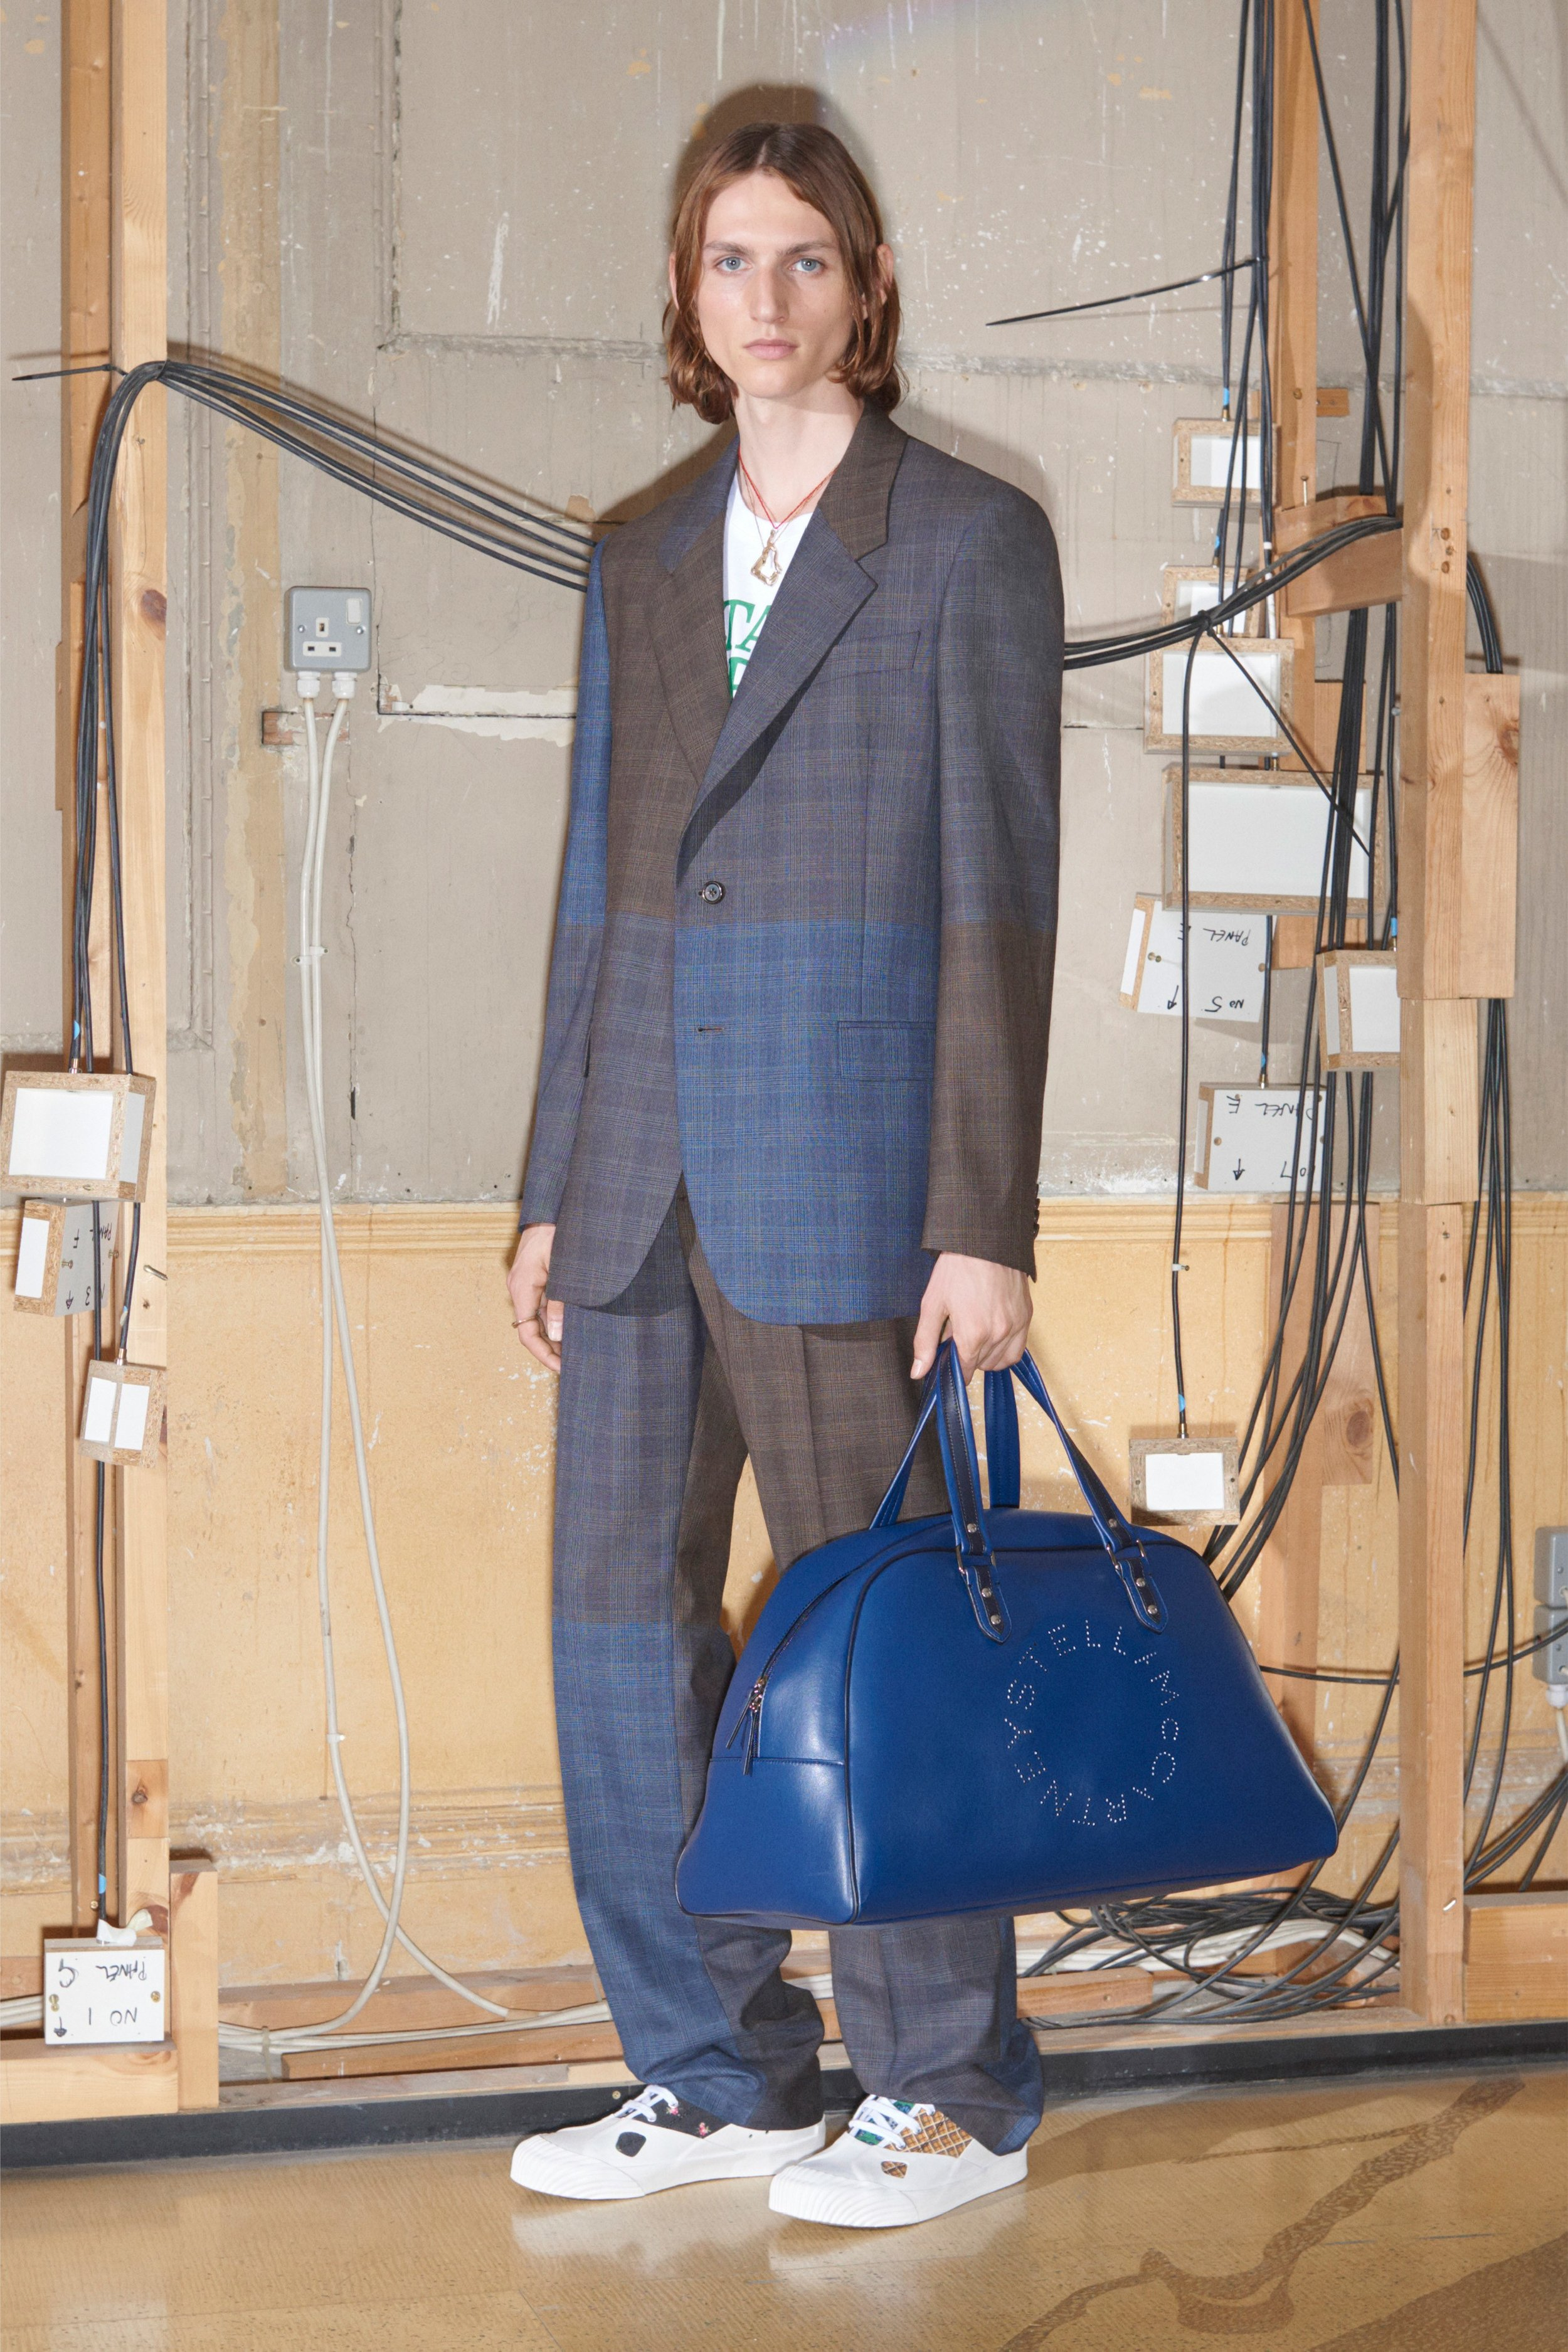 00016-Stella-McCartney-Vogue-Menswear-2019-pr.jpg